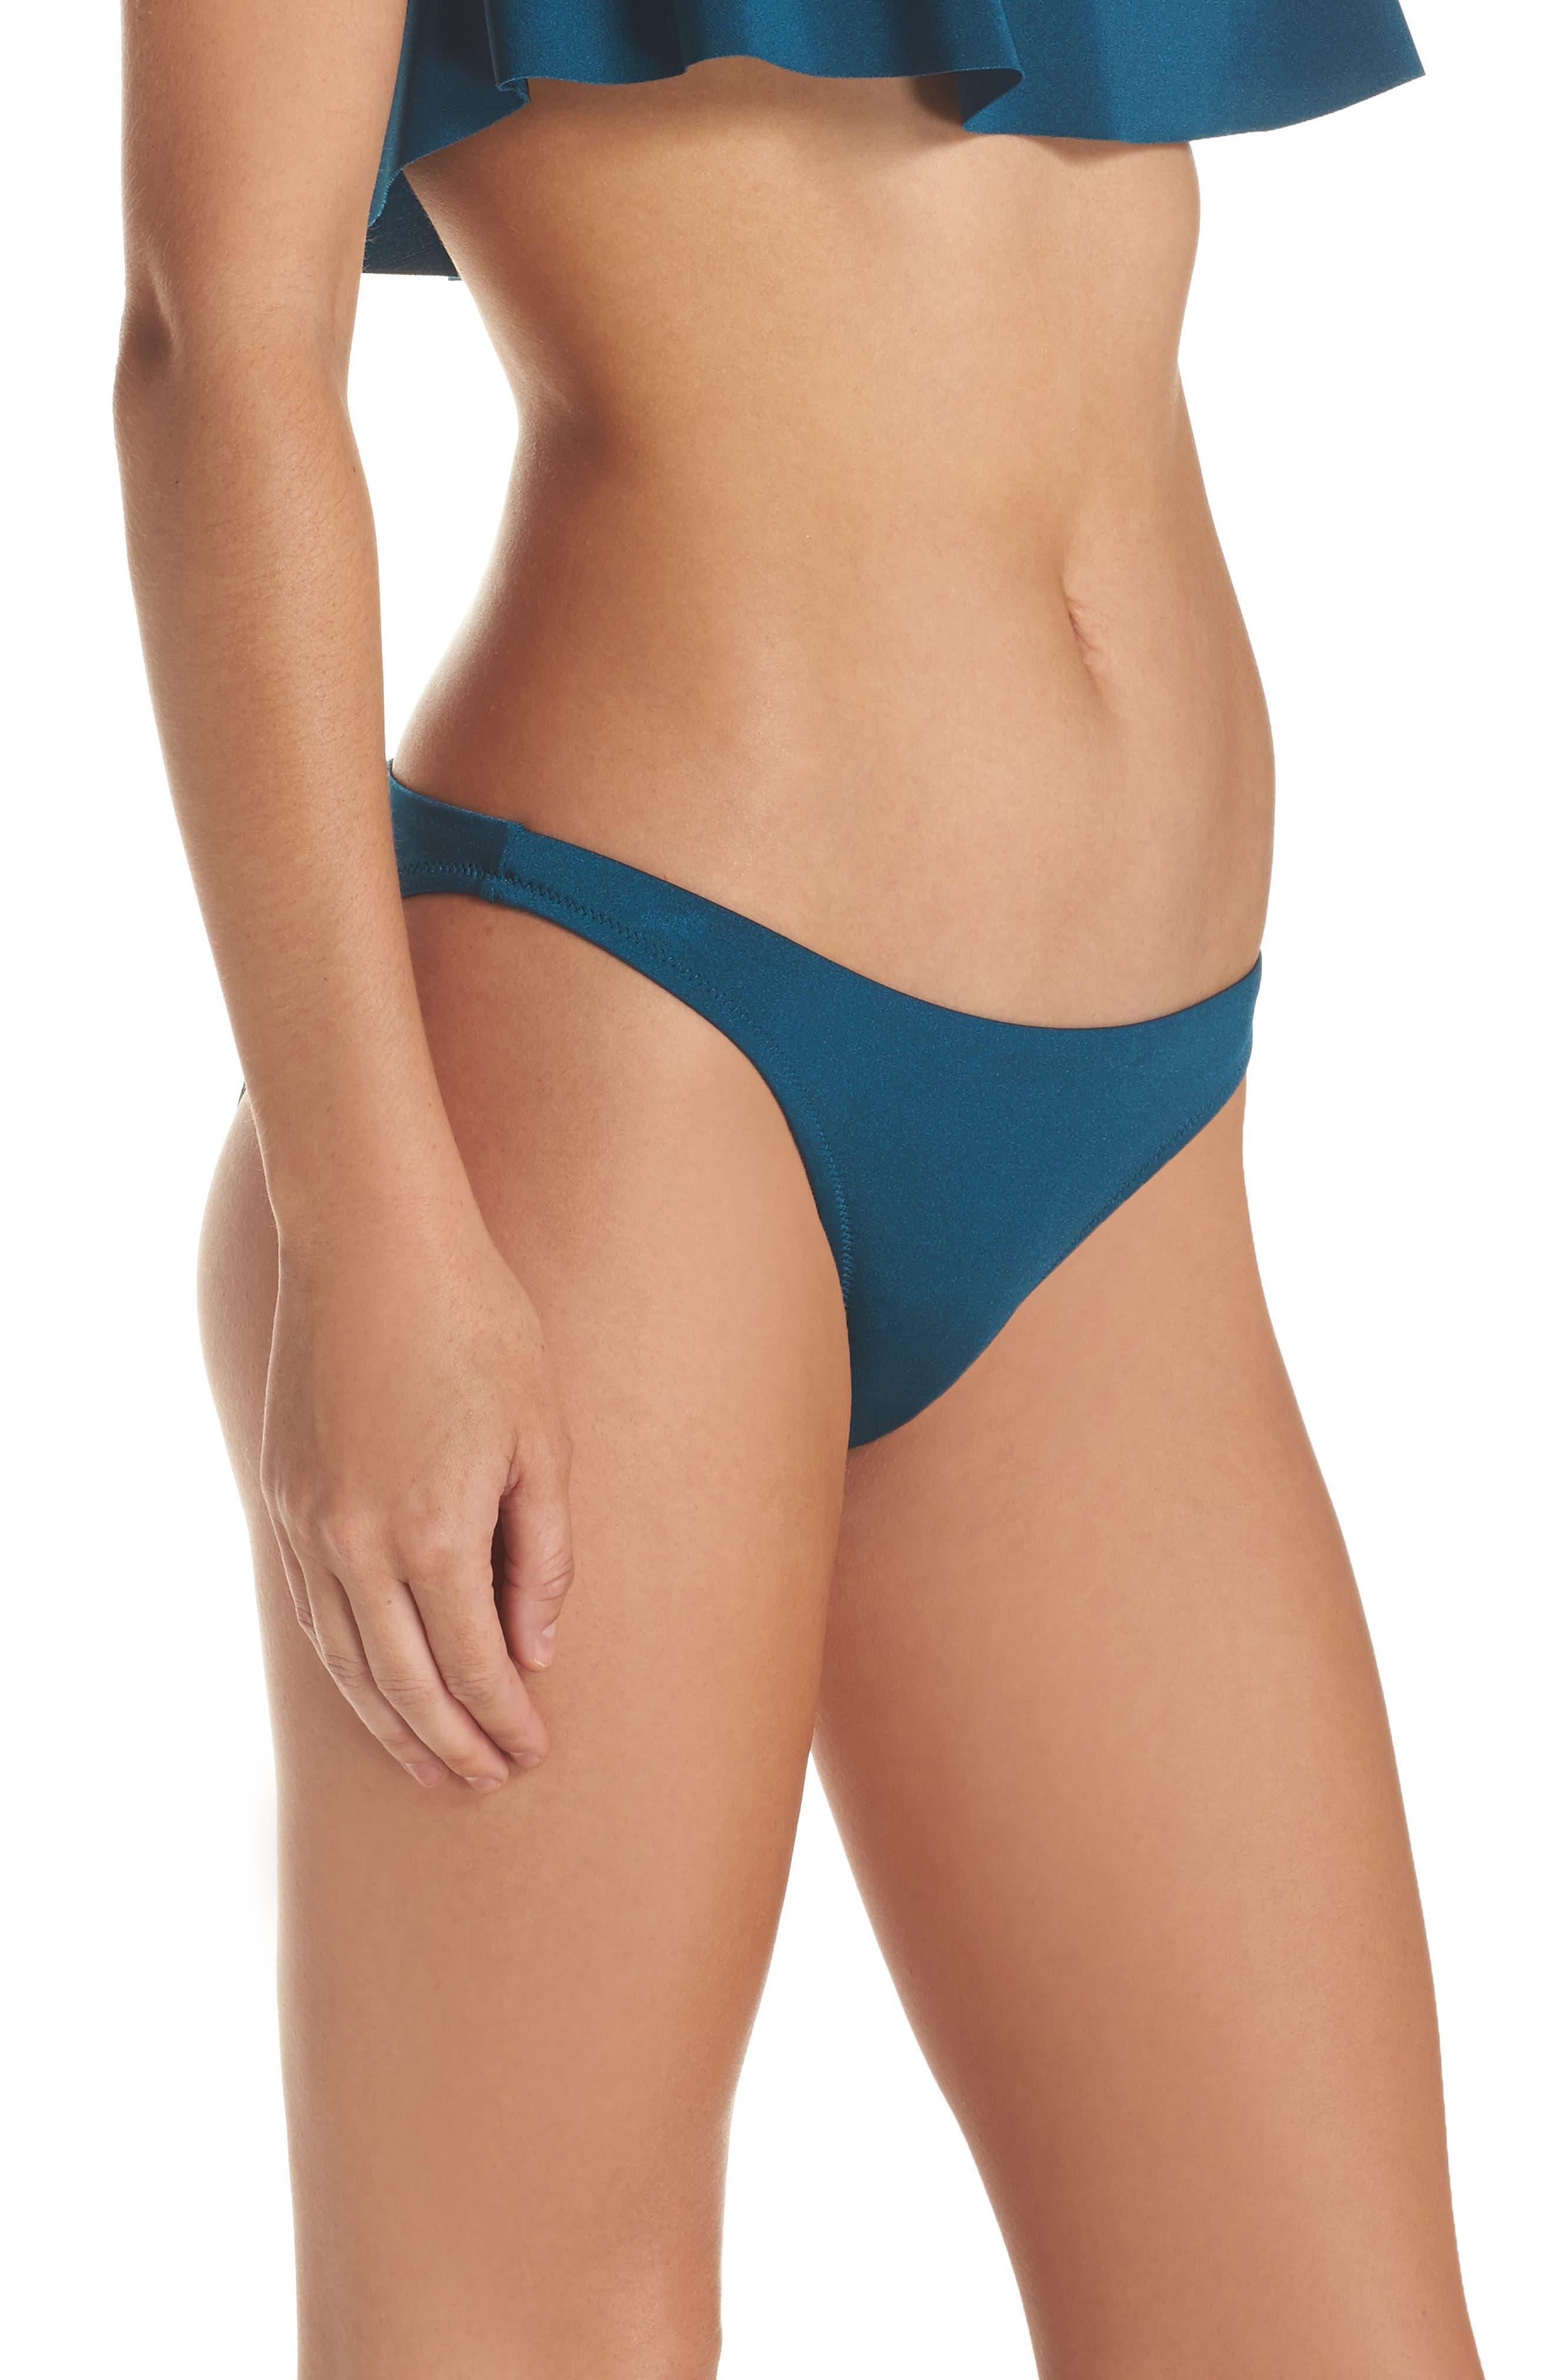 St. Lucia Bikini Bottoms,                             Alternate thumbnail 3, color,                             445